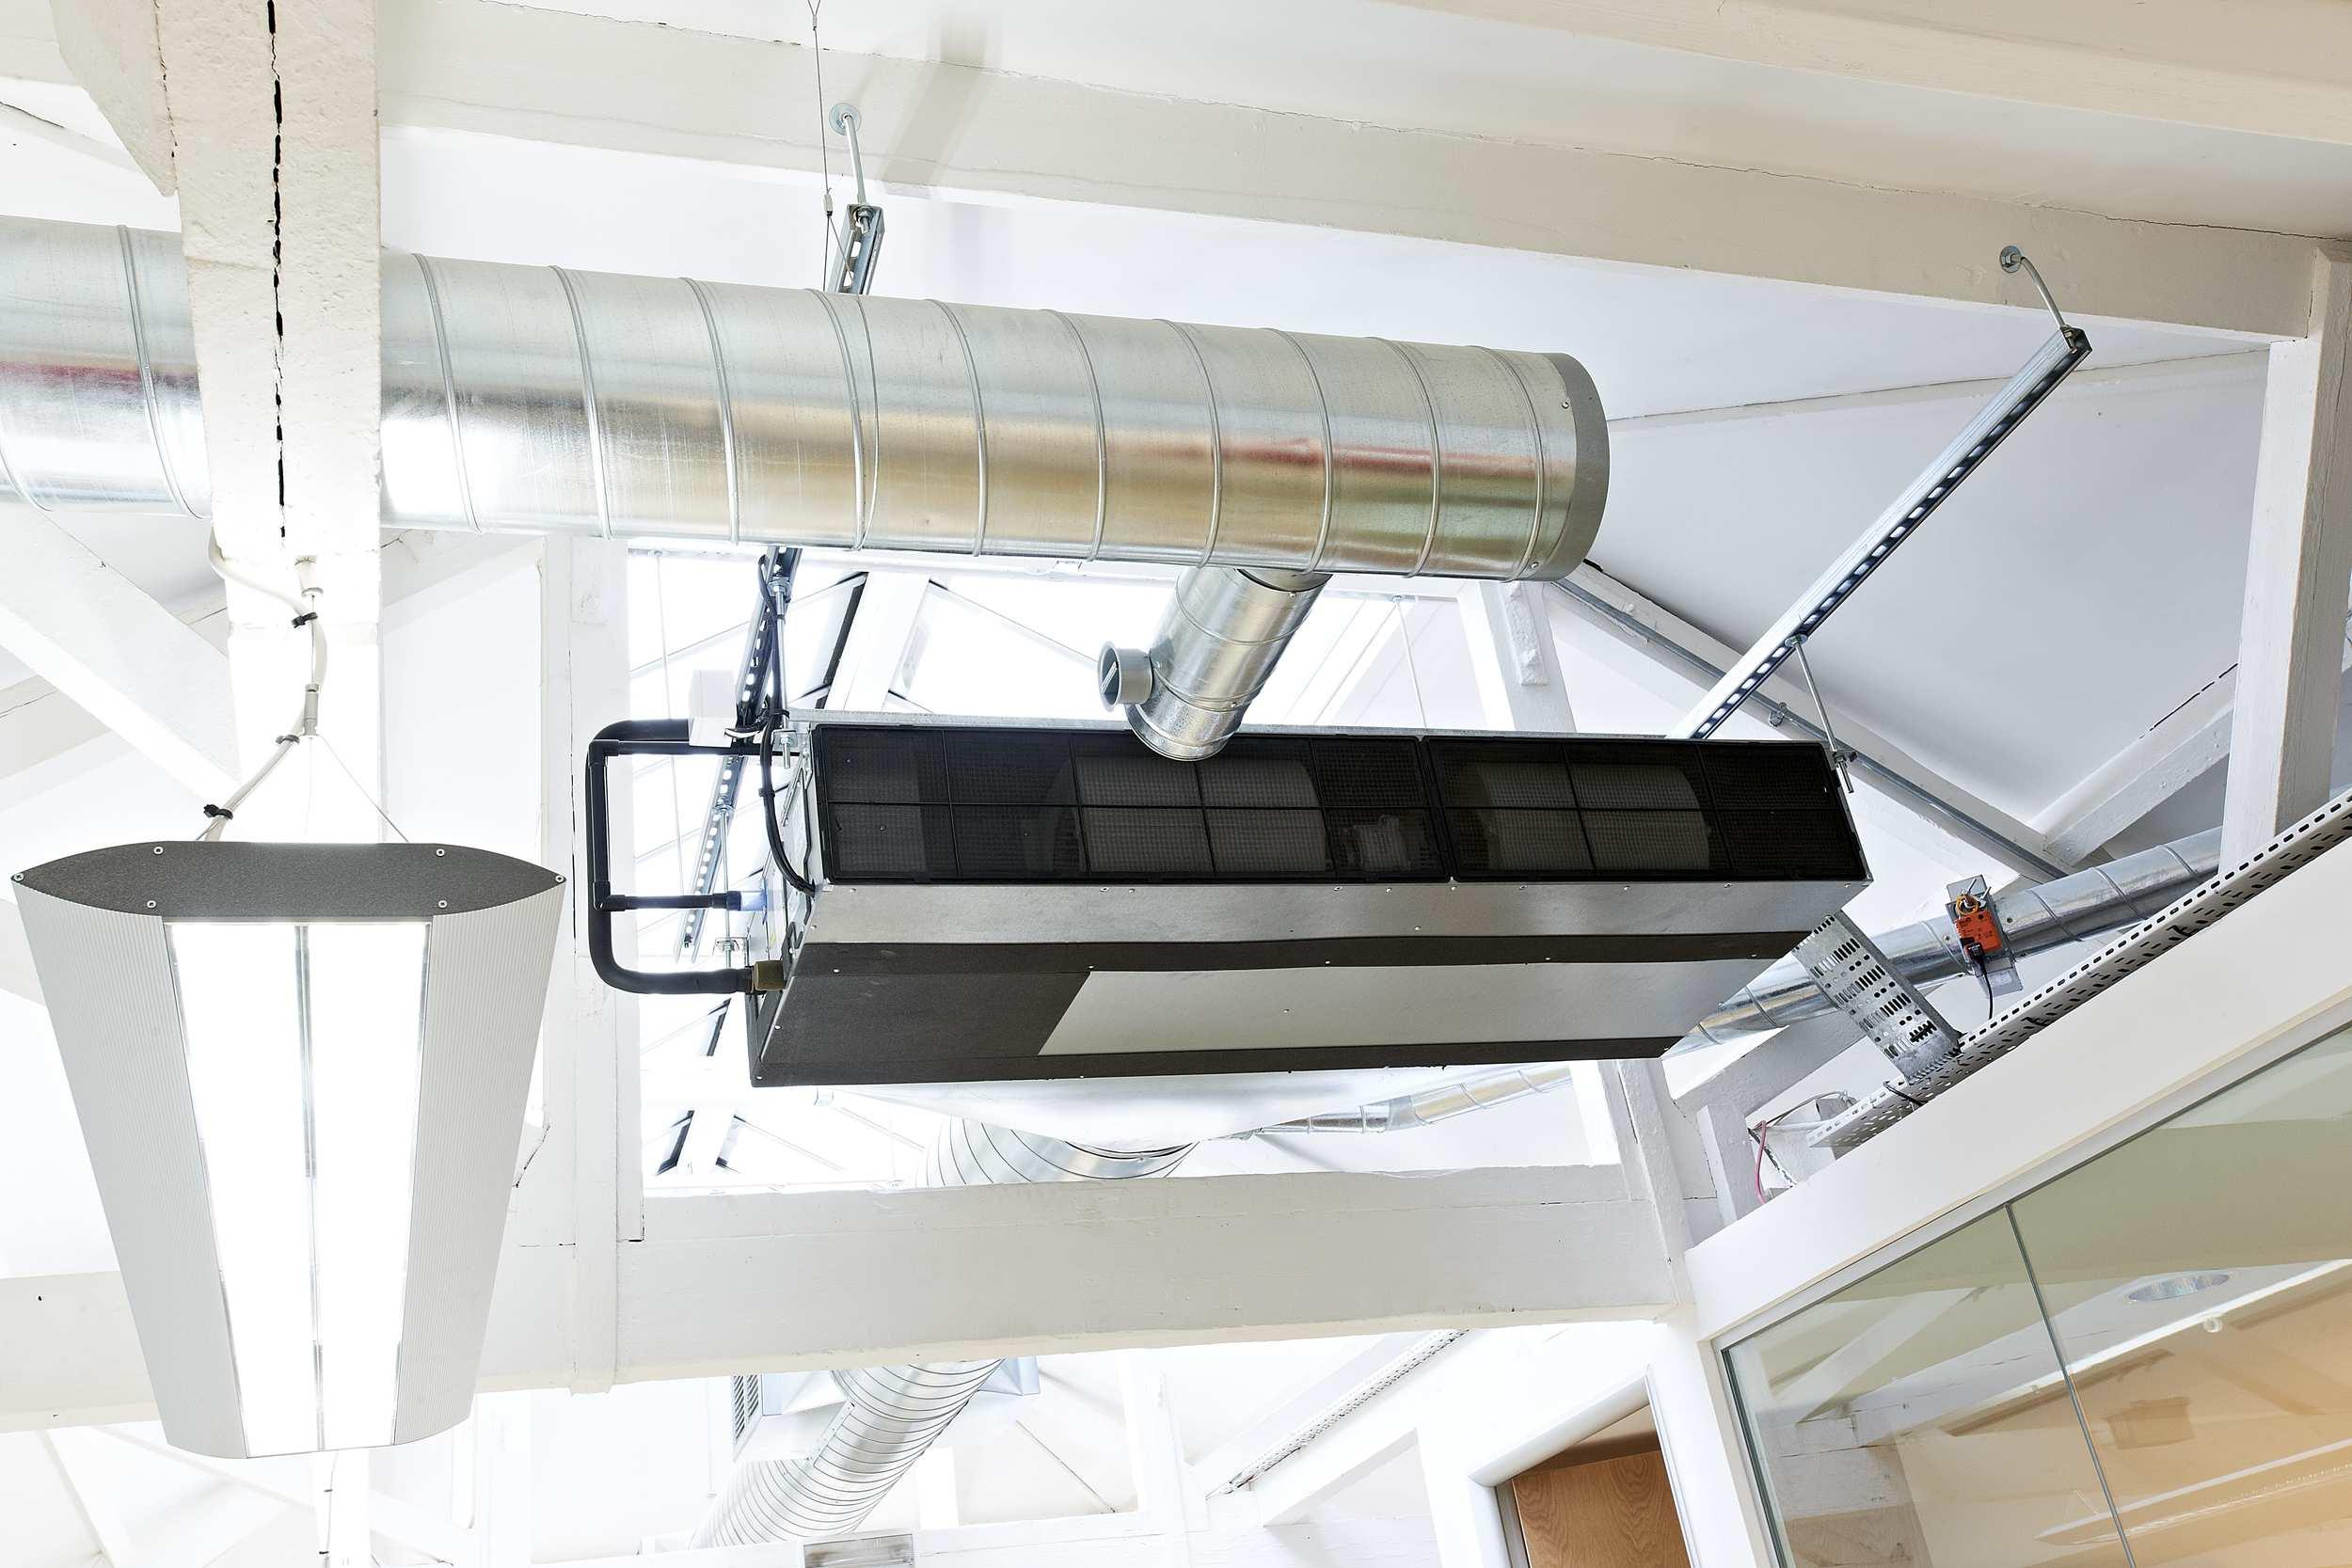 Cineflix-361-Degrees-Air-Conditioning-Case-Study-07.jpg